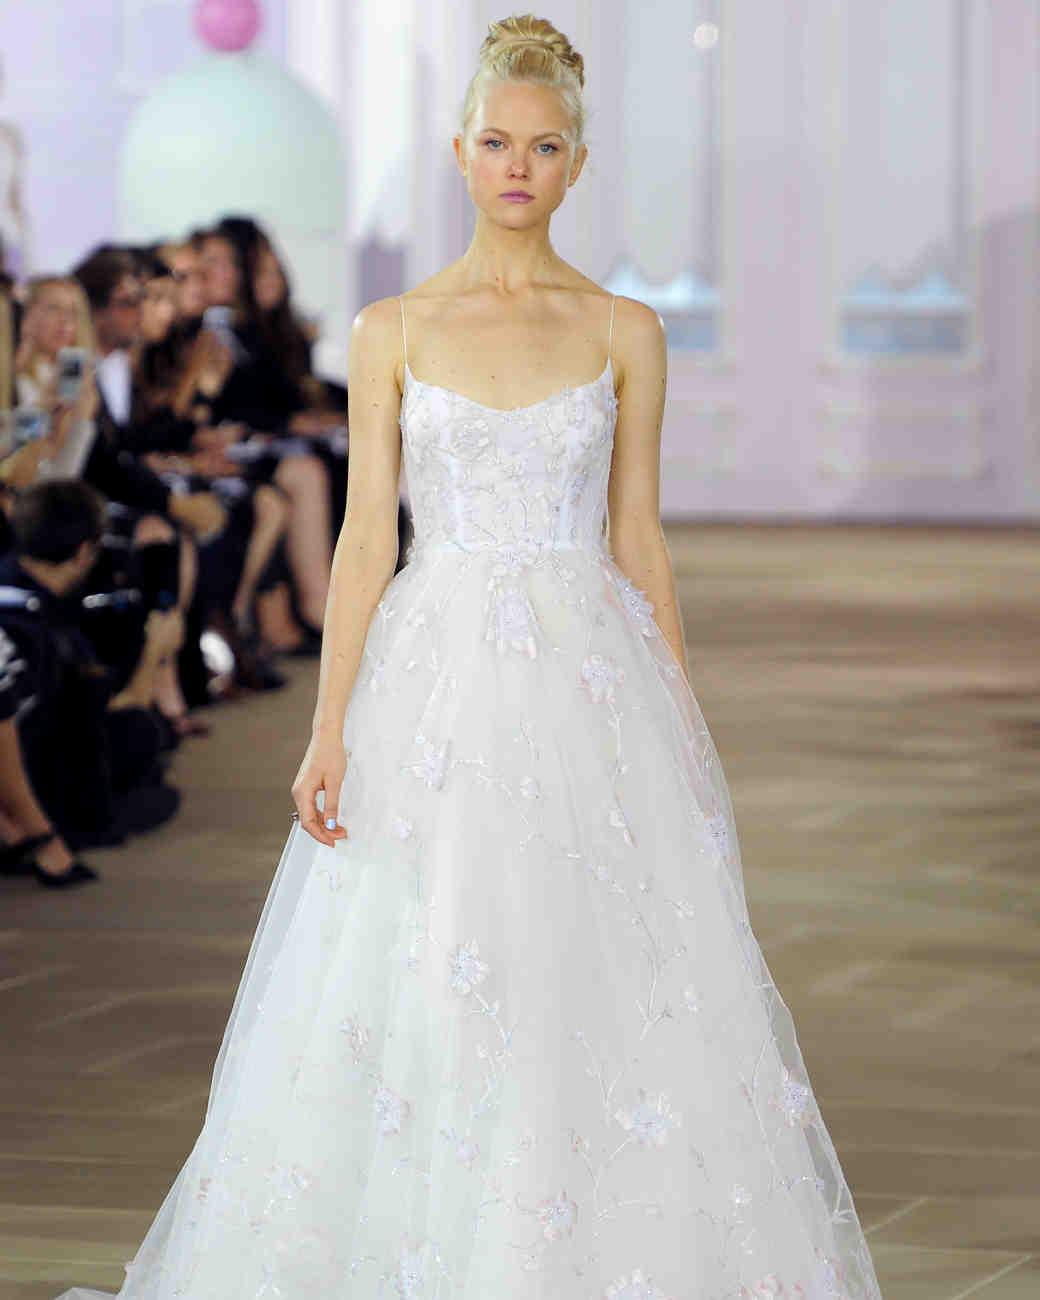 Audrey Hepburn Inspired Wedding Dresses 82 Epic Ines Di Santo Fall